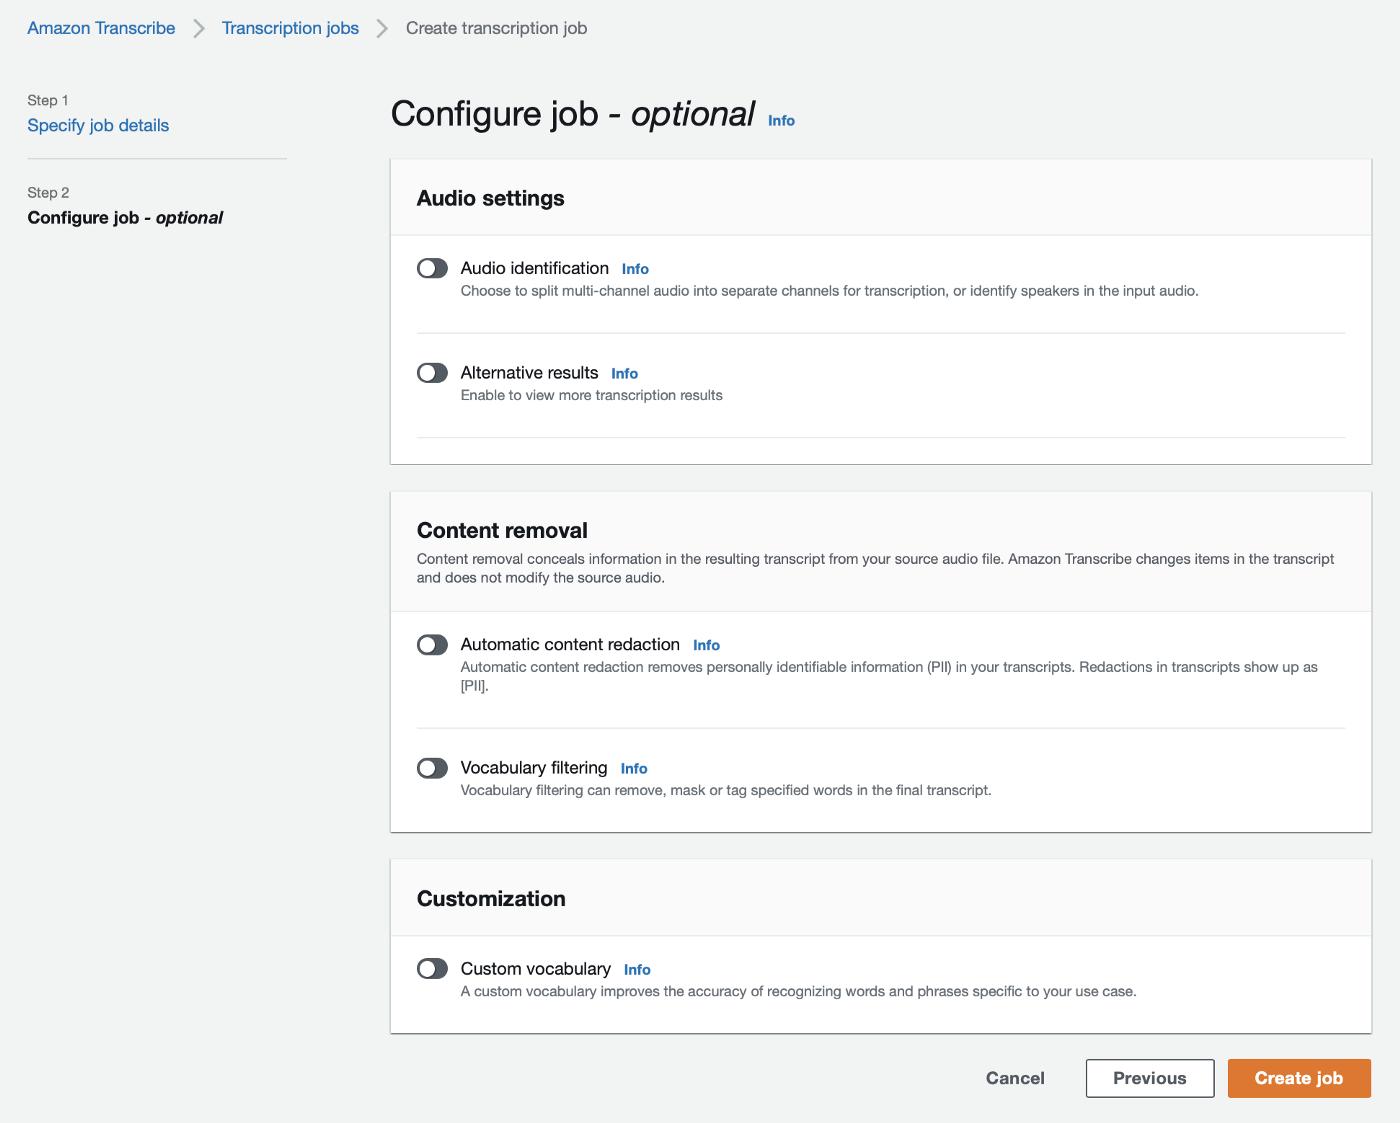 Configure transcription job with optional settings